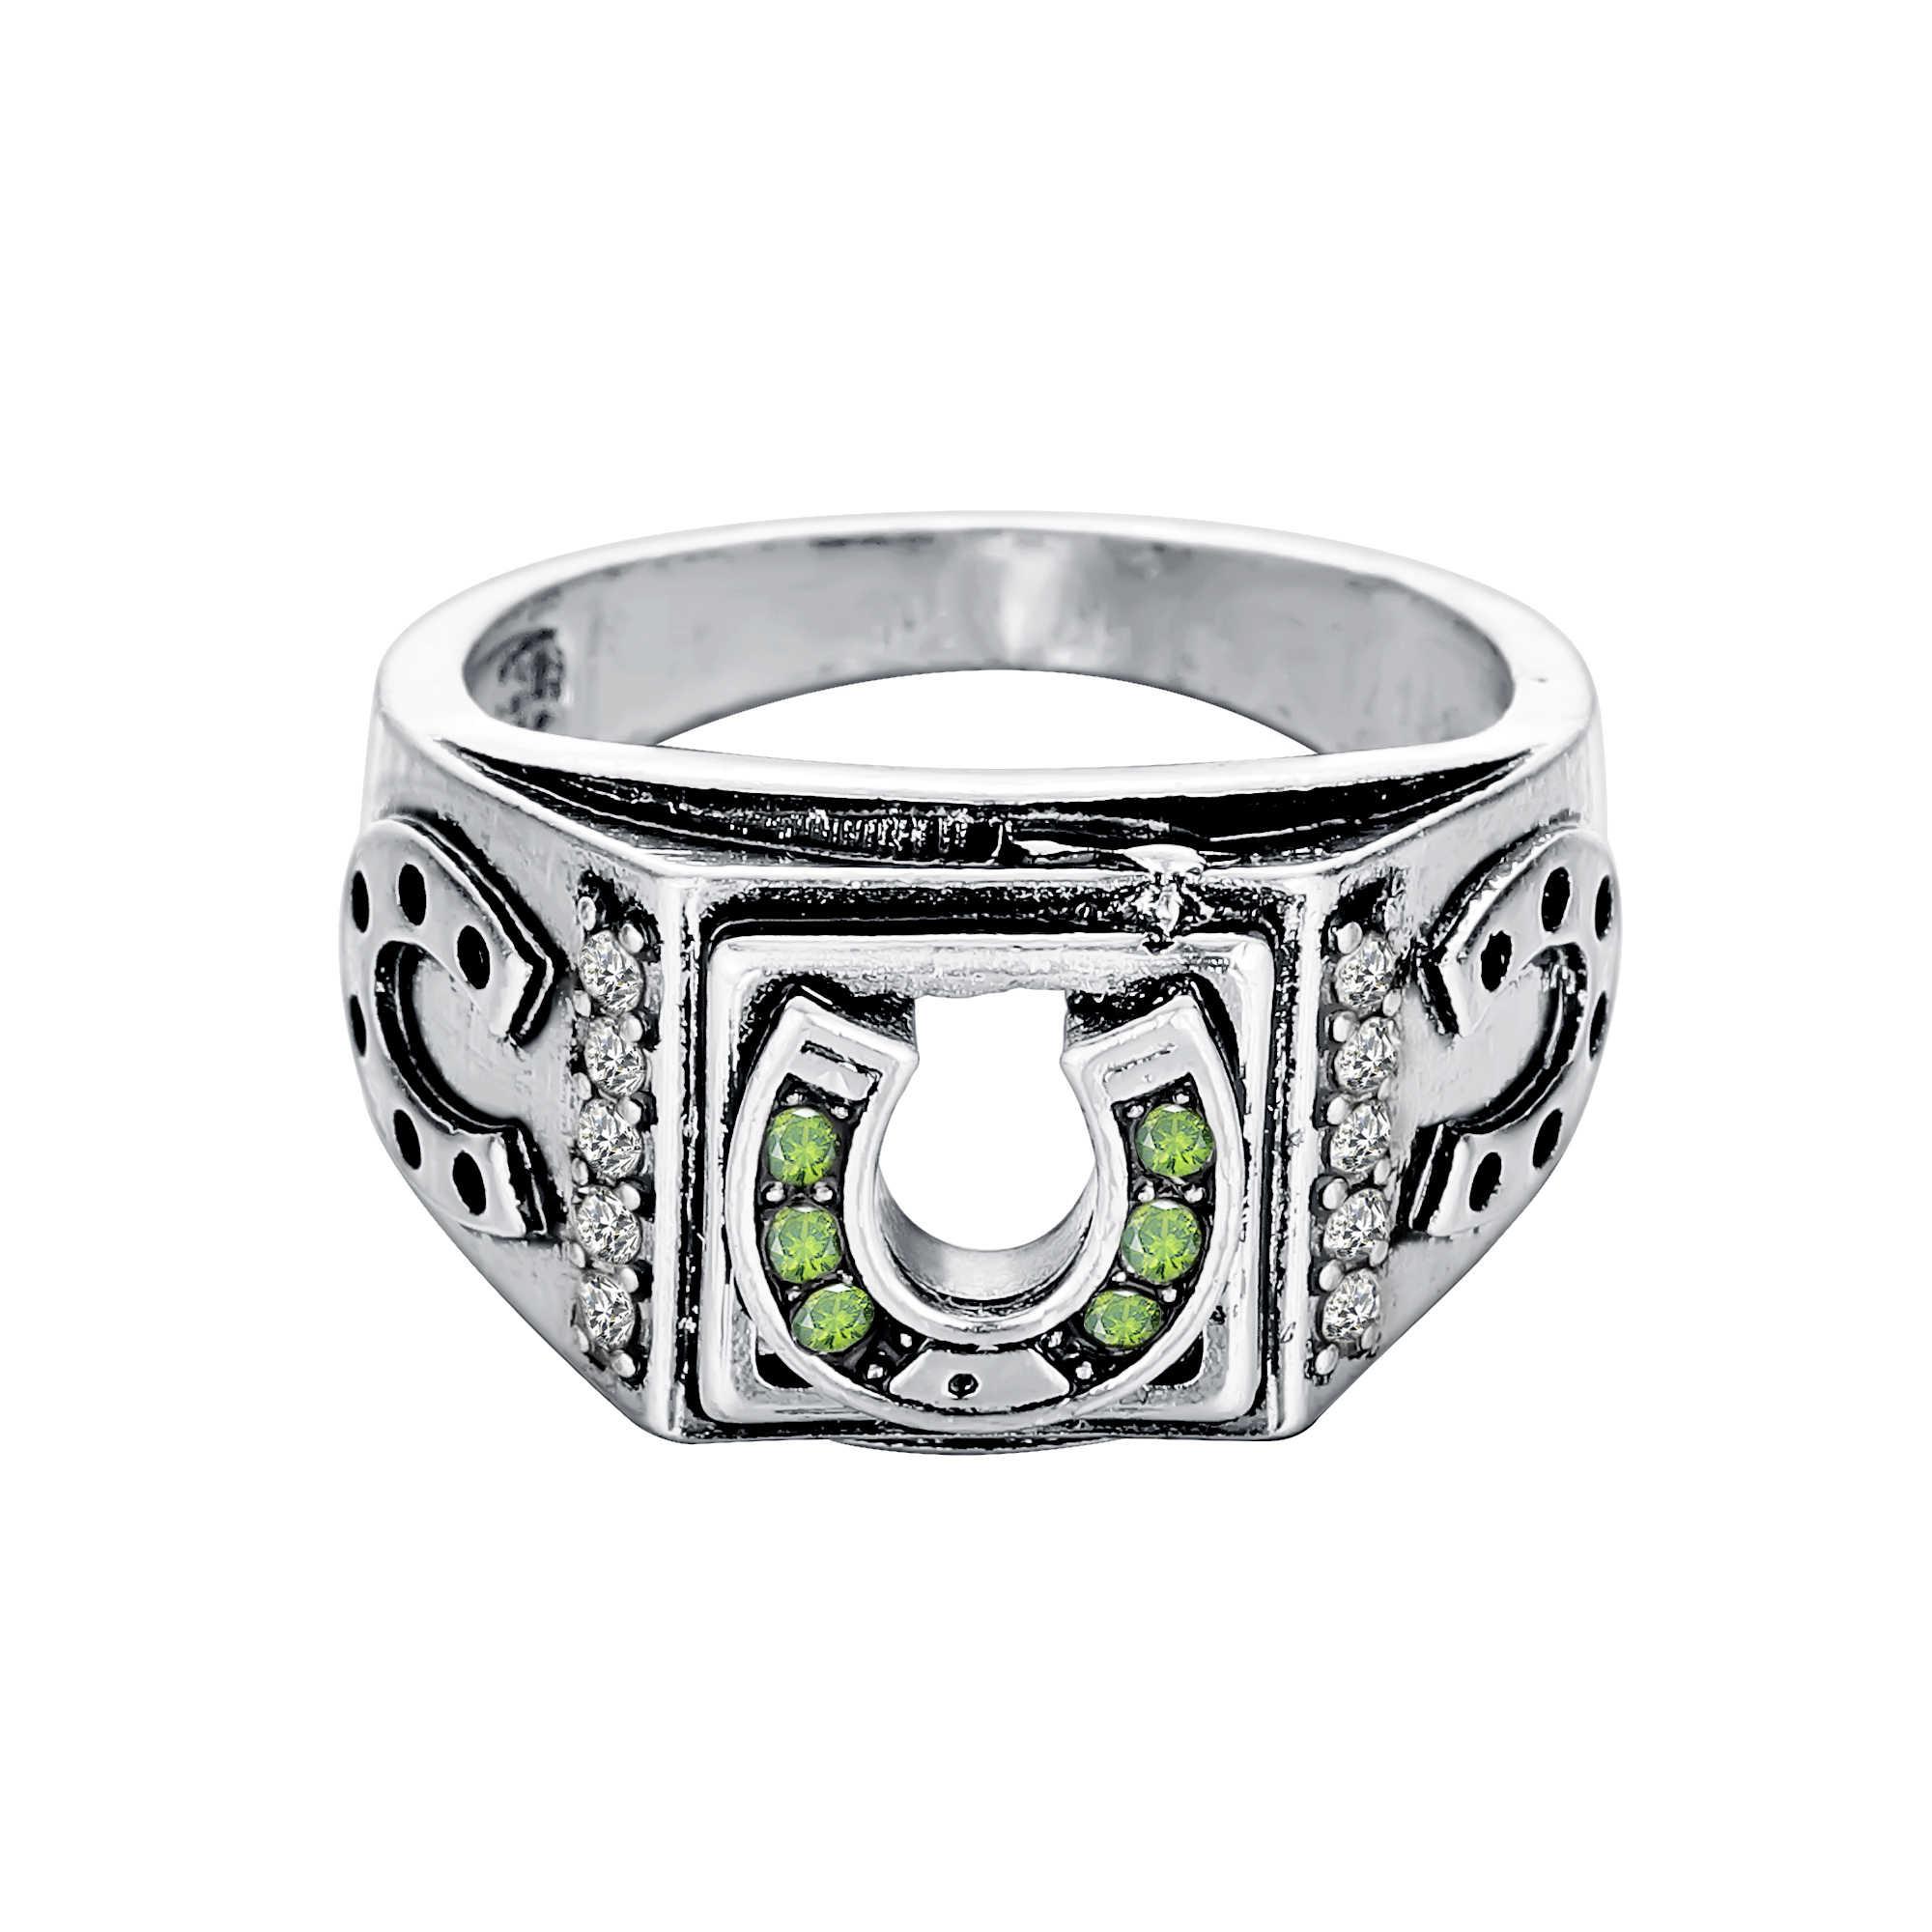 Slavic Men S Rings Kolovrat Pagan Jewelry Simple Rune Signet Talisman Bague Ring Norse Viking Jewelry For Men Kinitial Brand